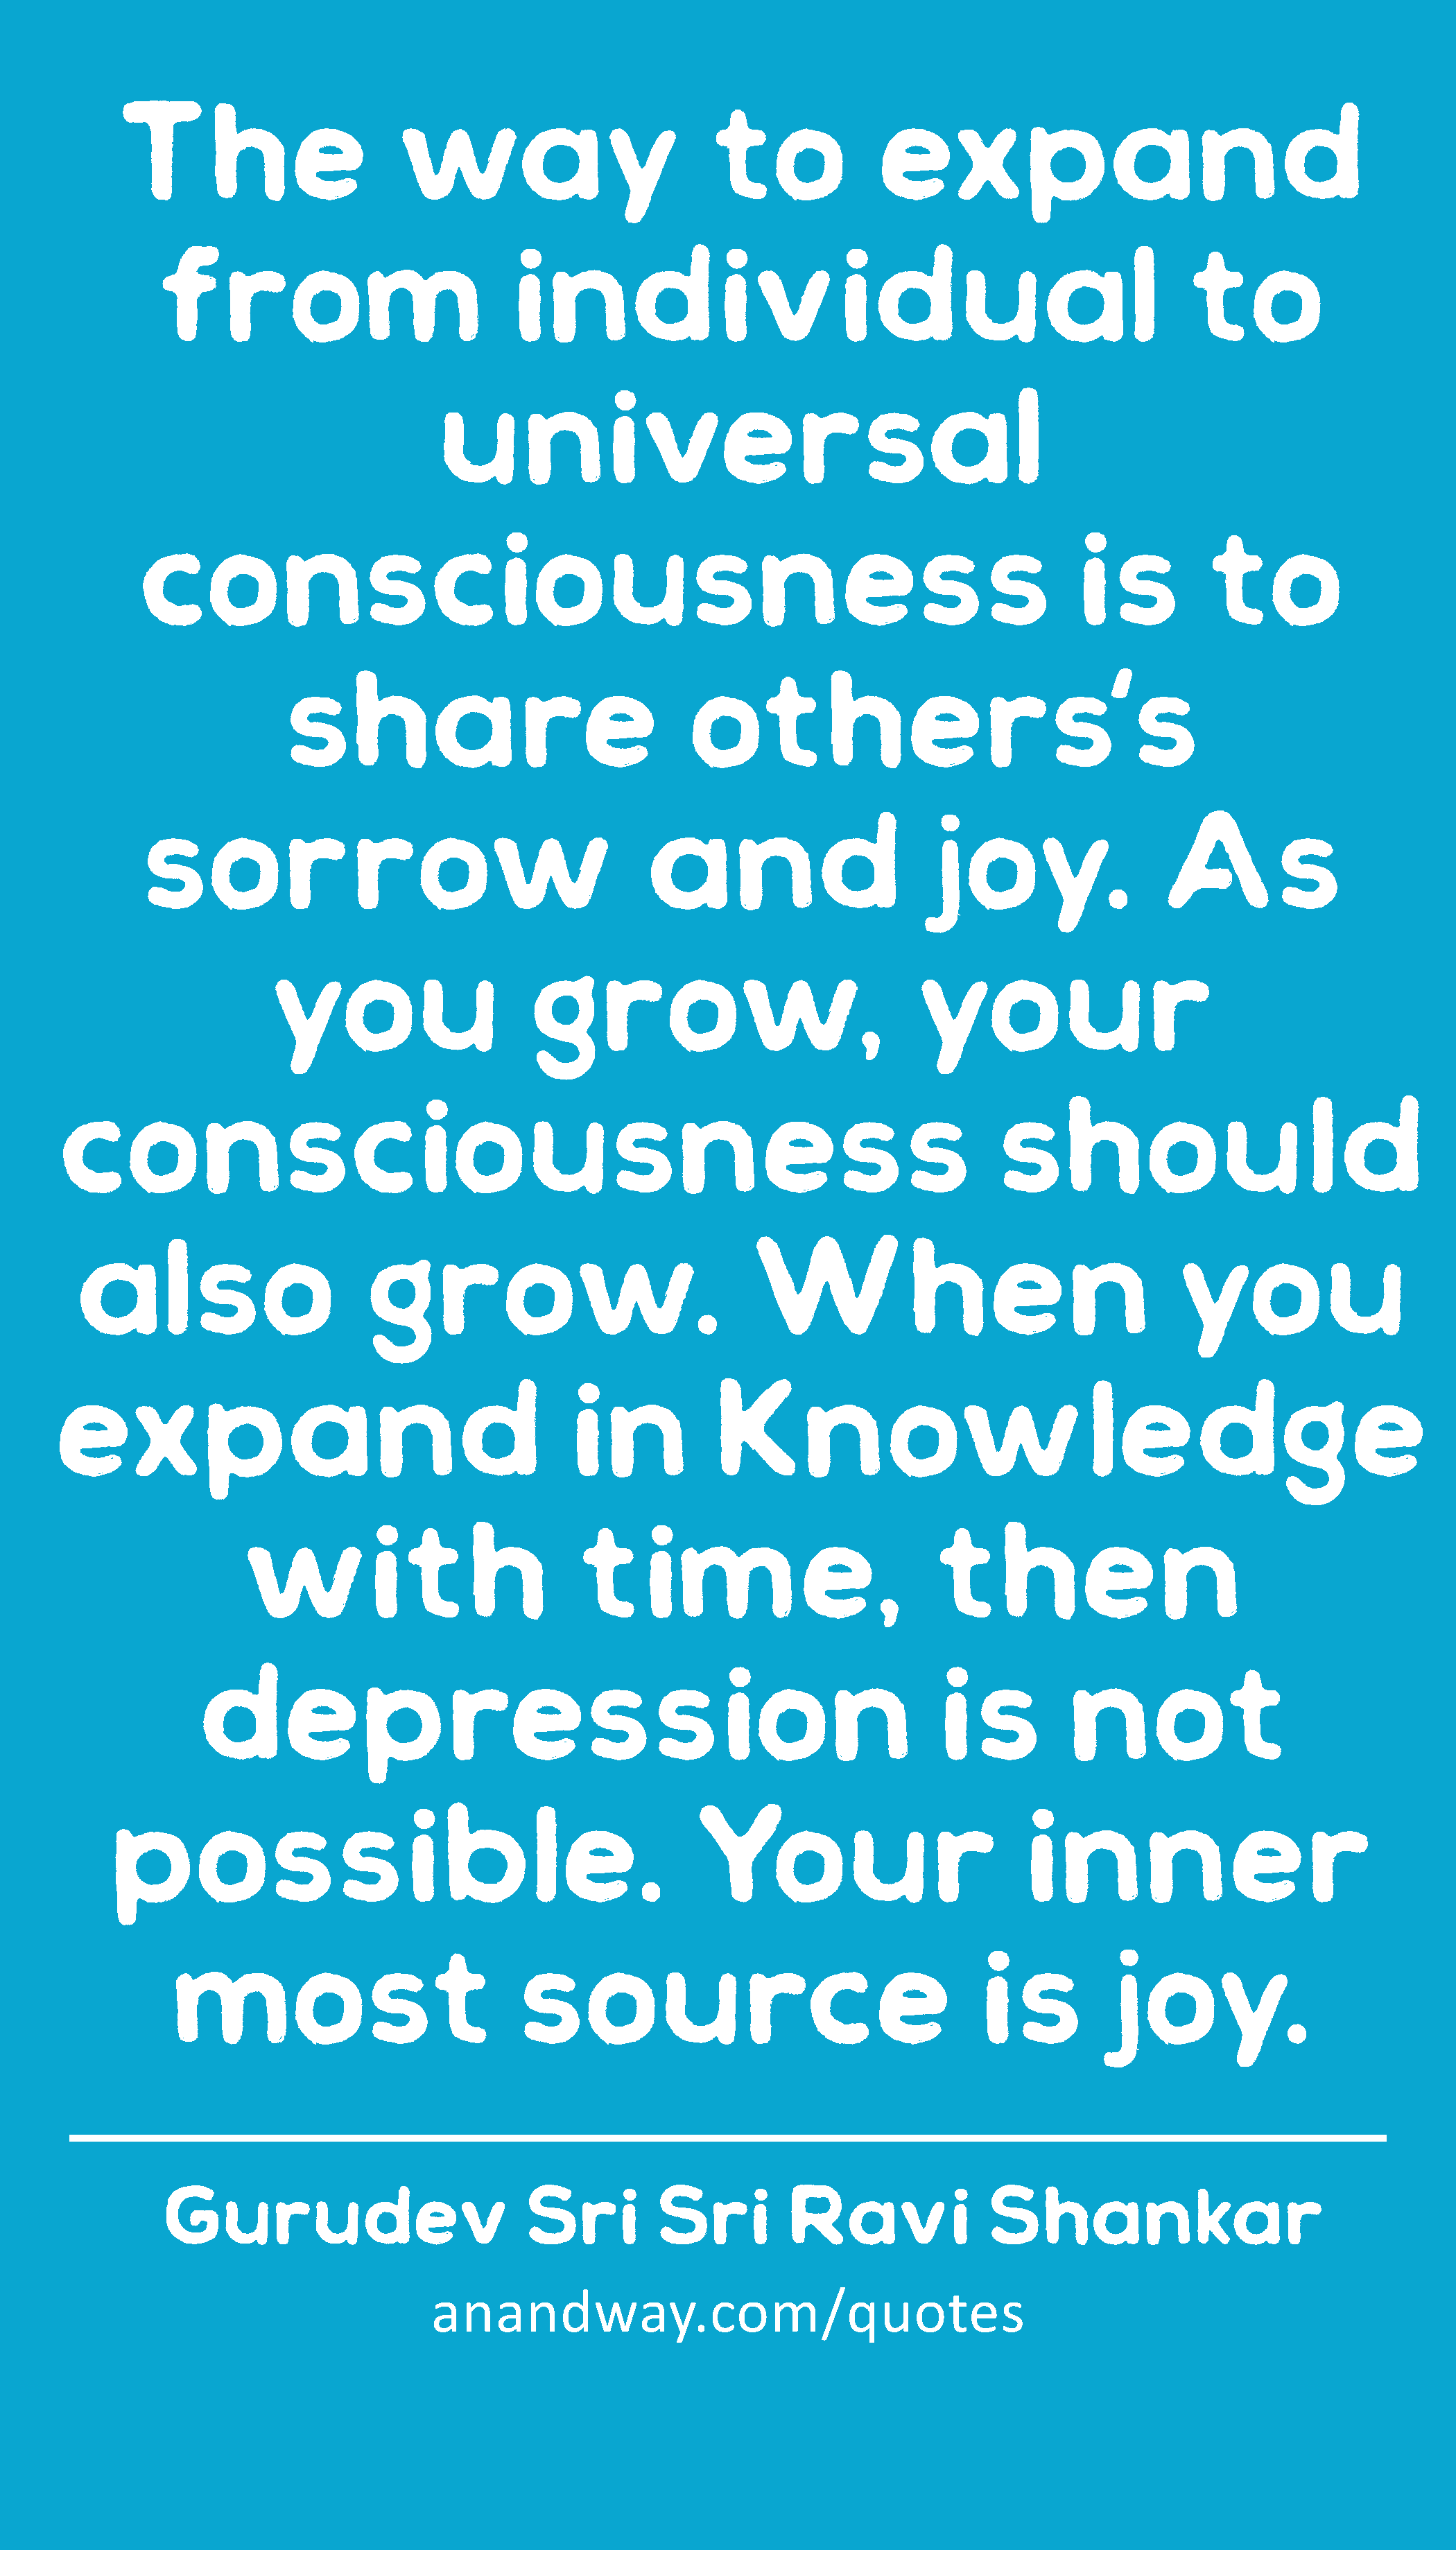 quotes on consciousness by gurudev sri sri ravi shankar